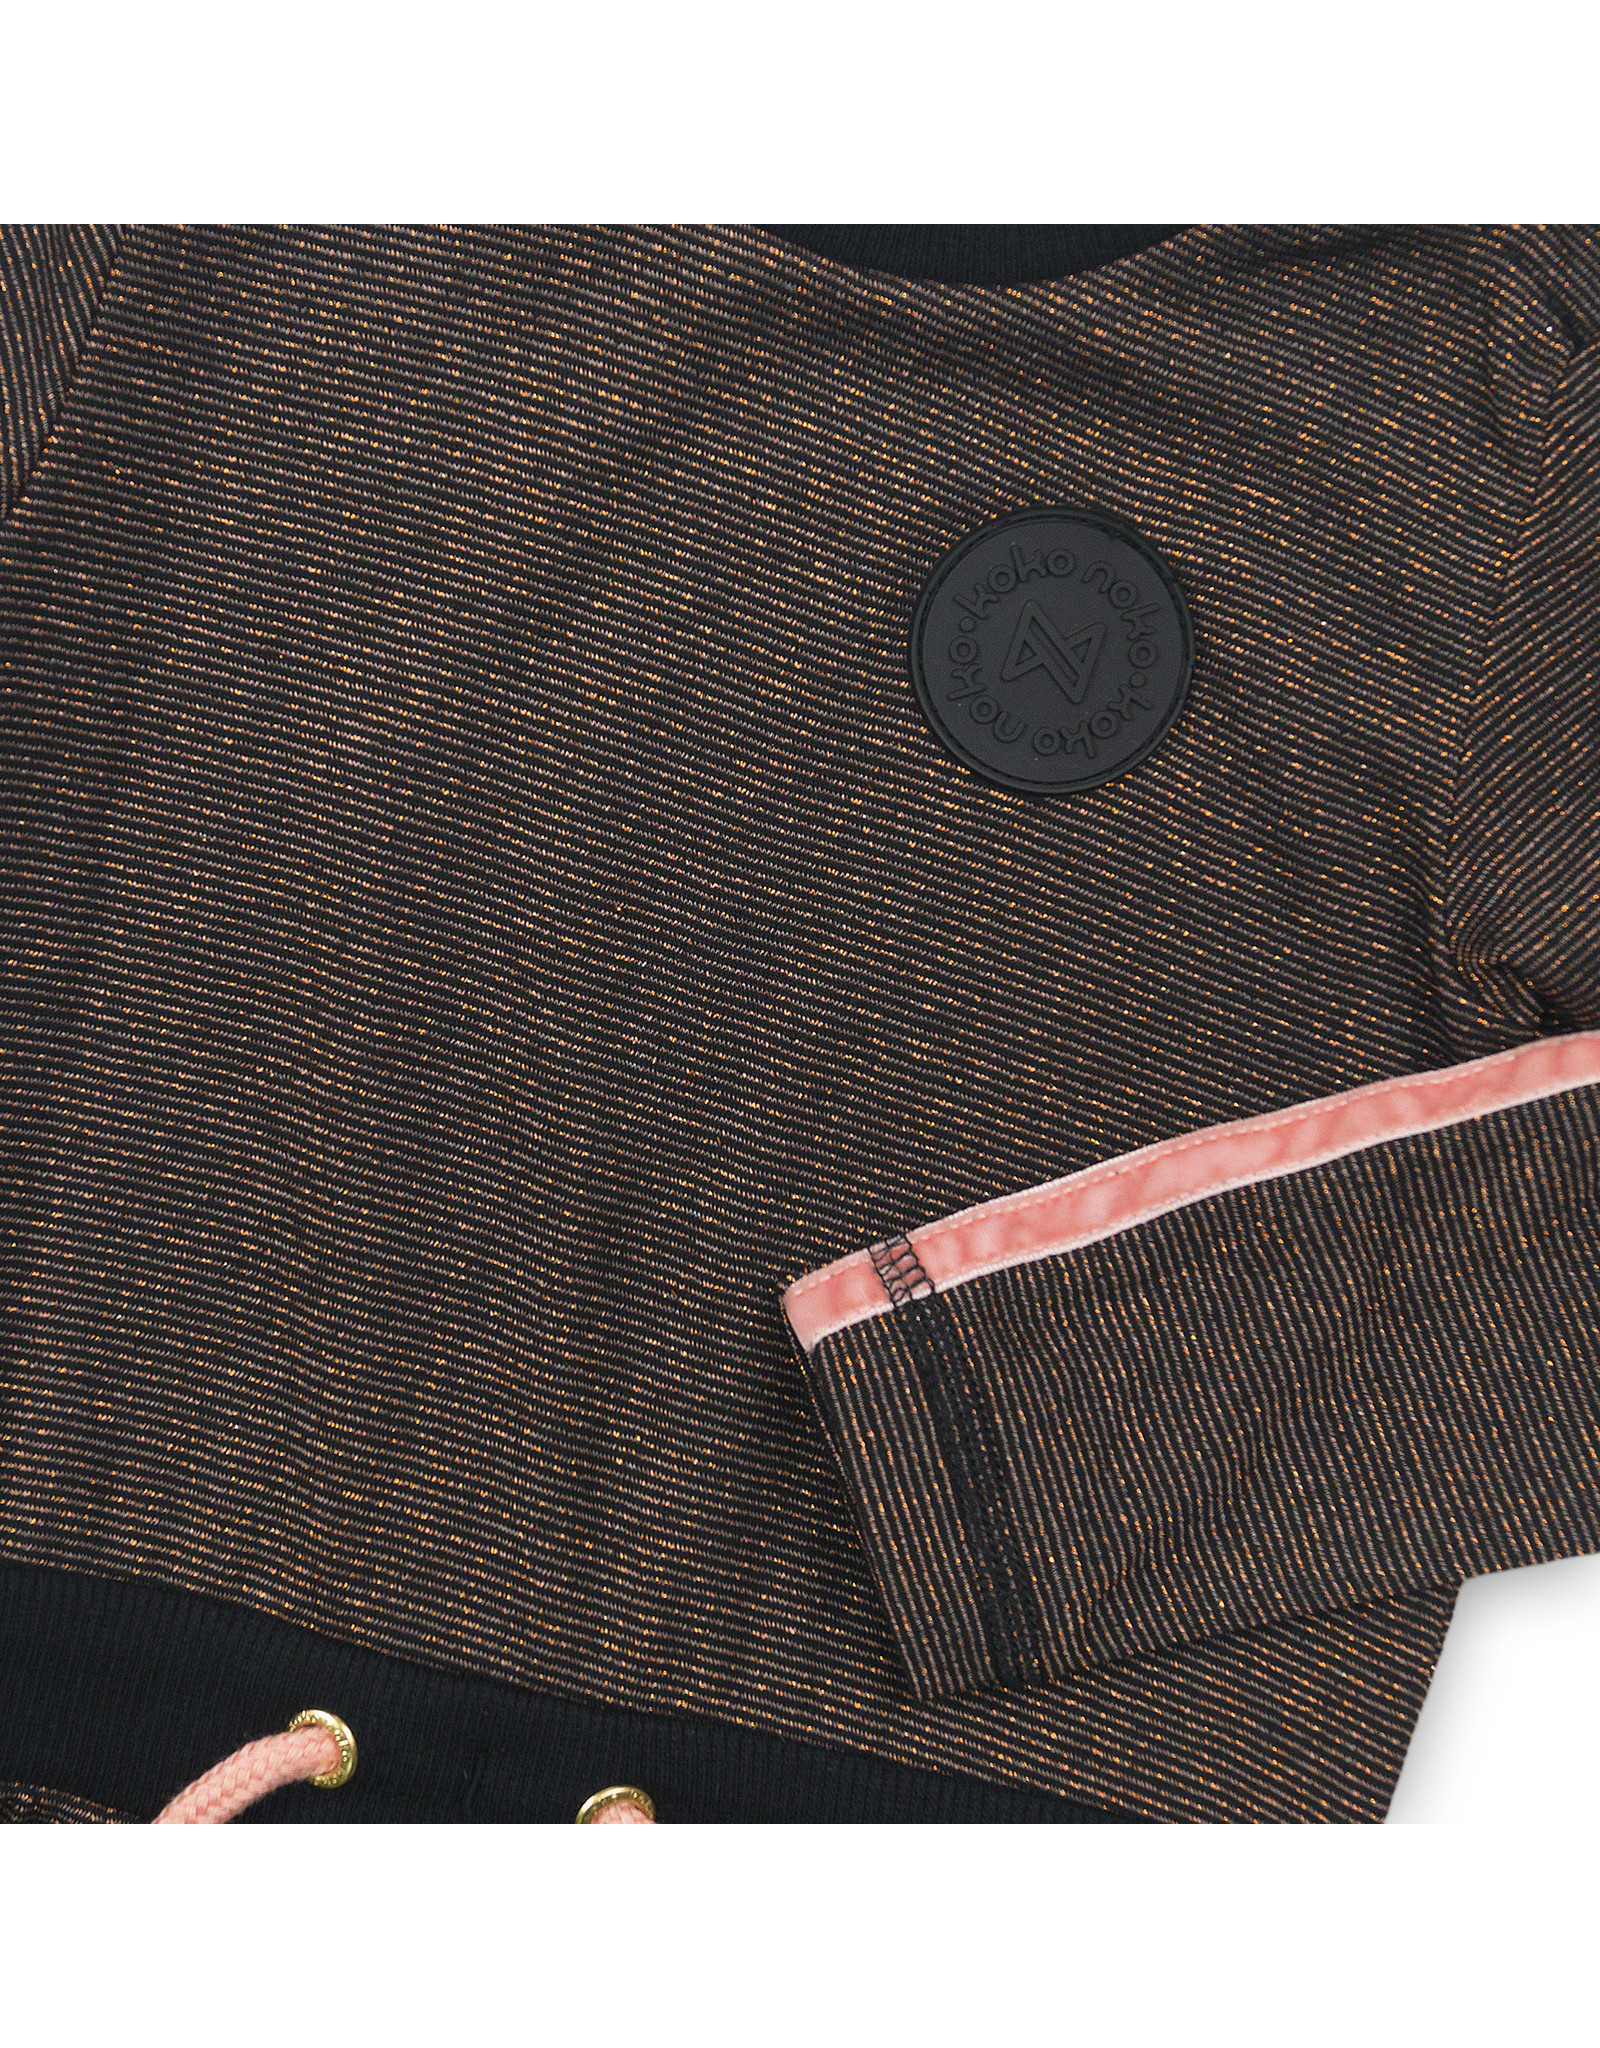 Koko Noko Dress, Rosé glitter + black